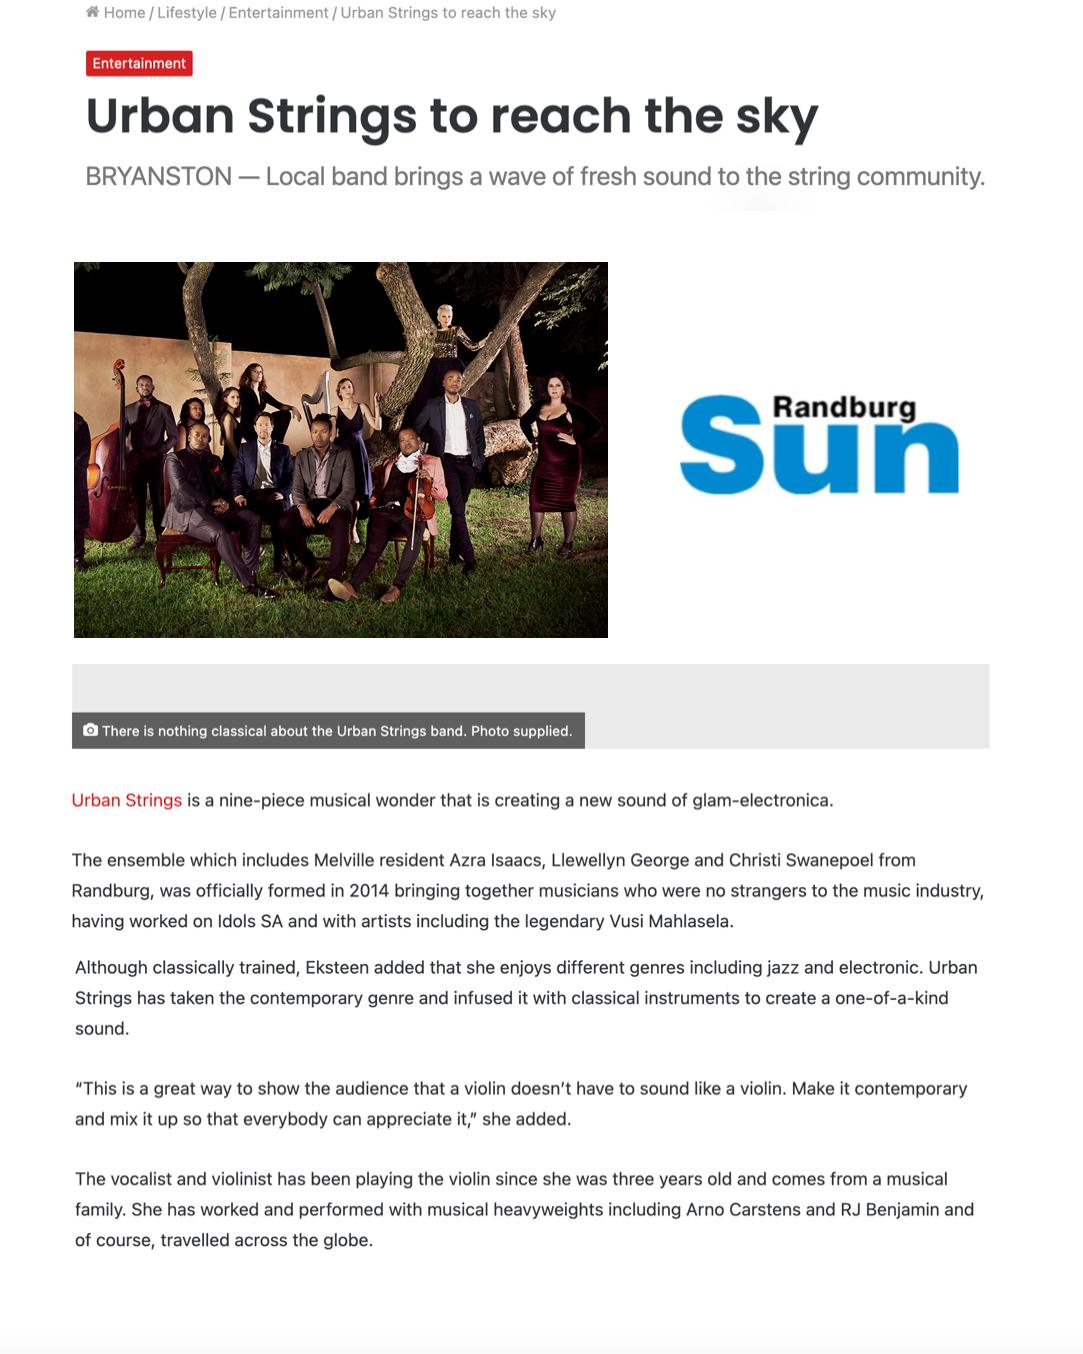 Randburg Sun